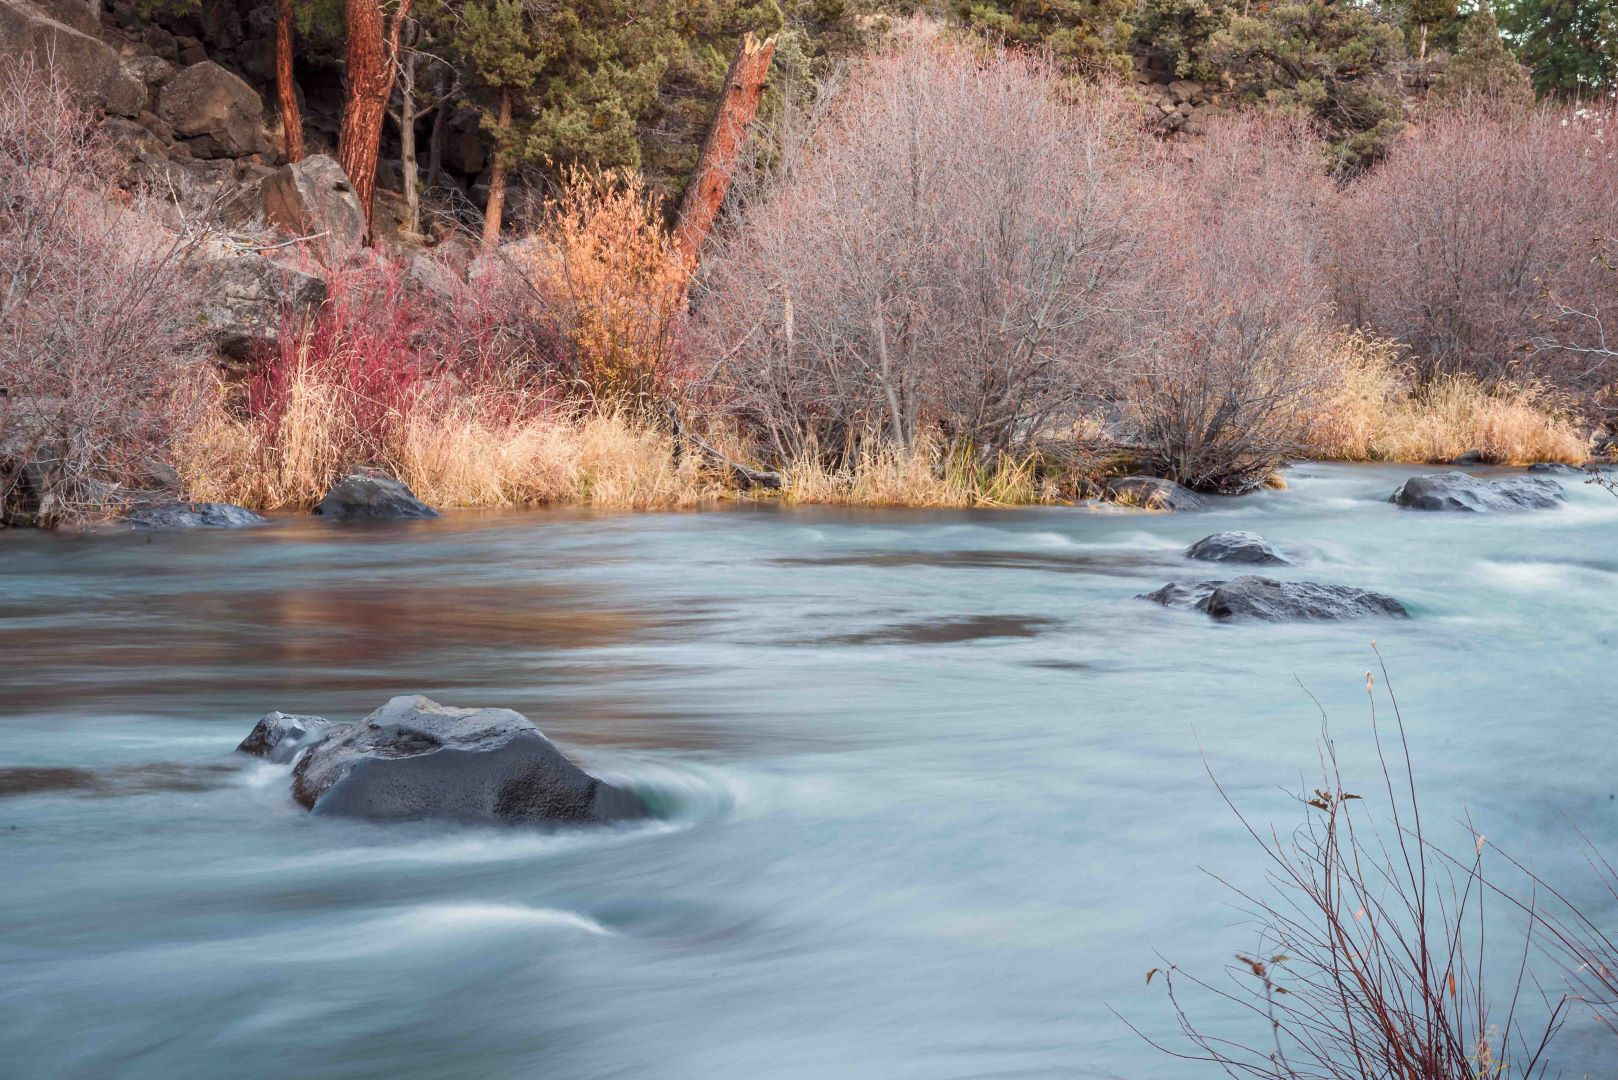 bend oregon deshchuttes river stone landscape photography